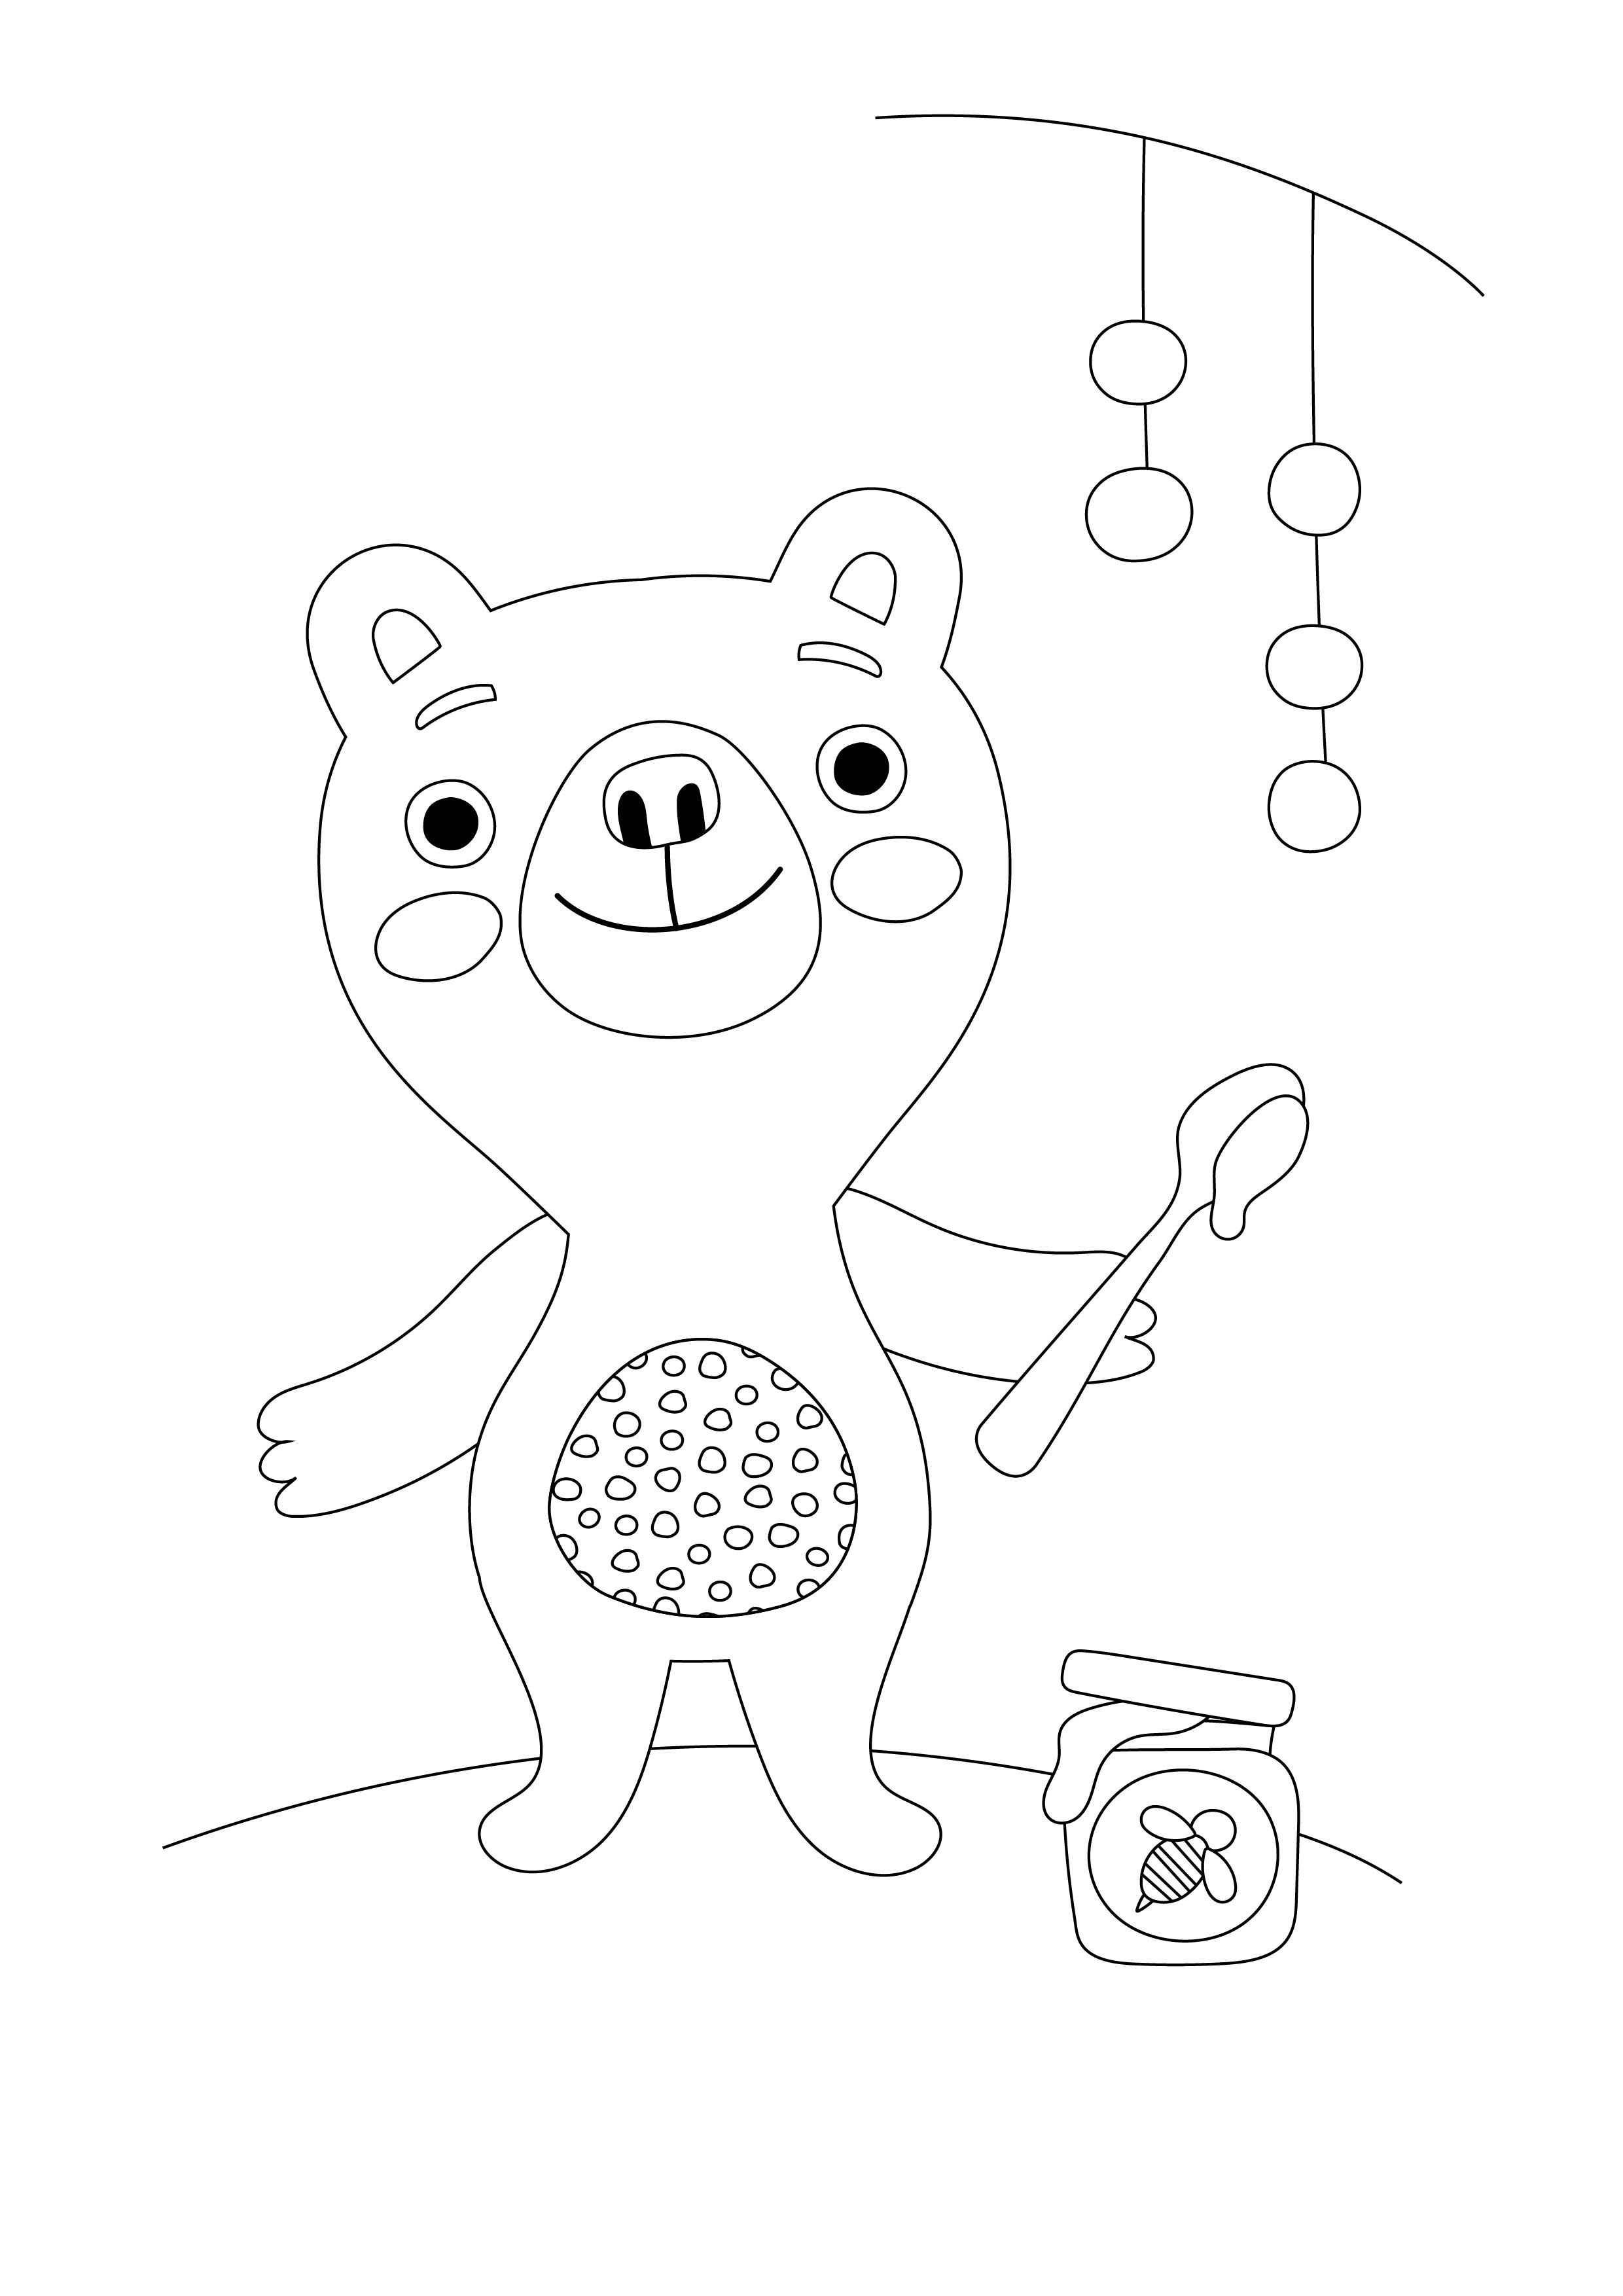 Coloring book varityskuvat - V Rityskuva Free Printable Pattern Lasten Lapset Joulu Idea Askartelu